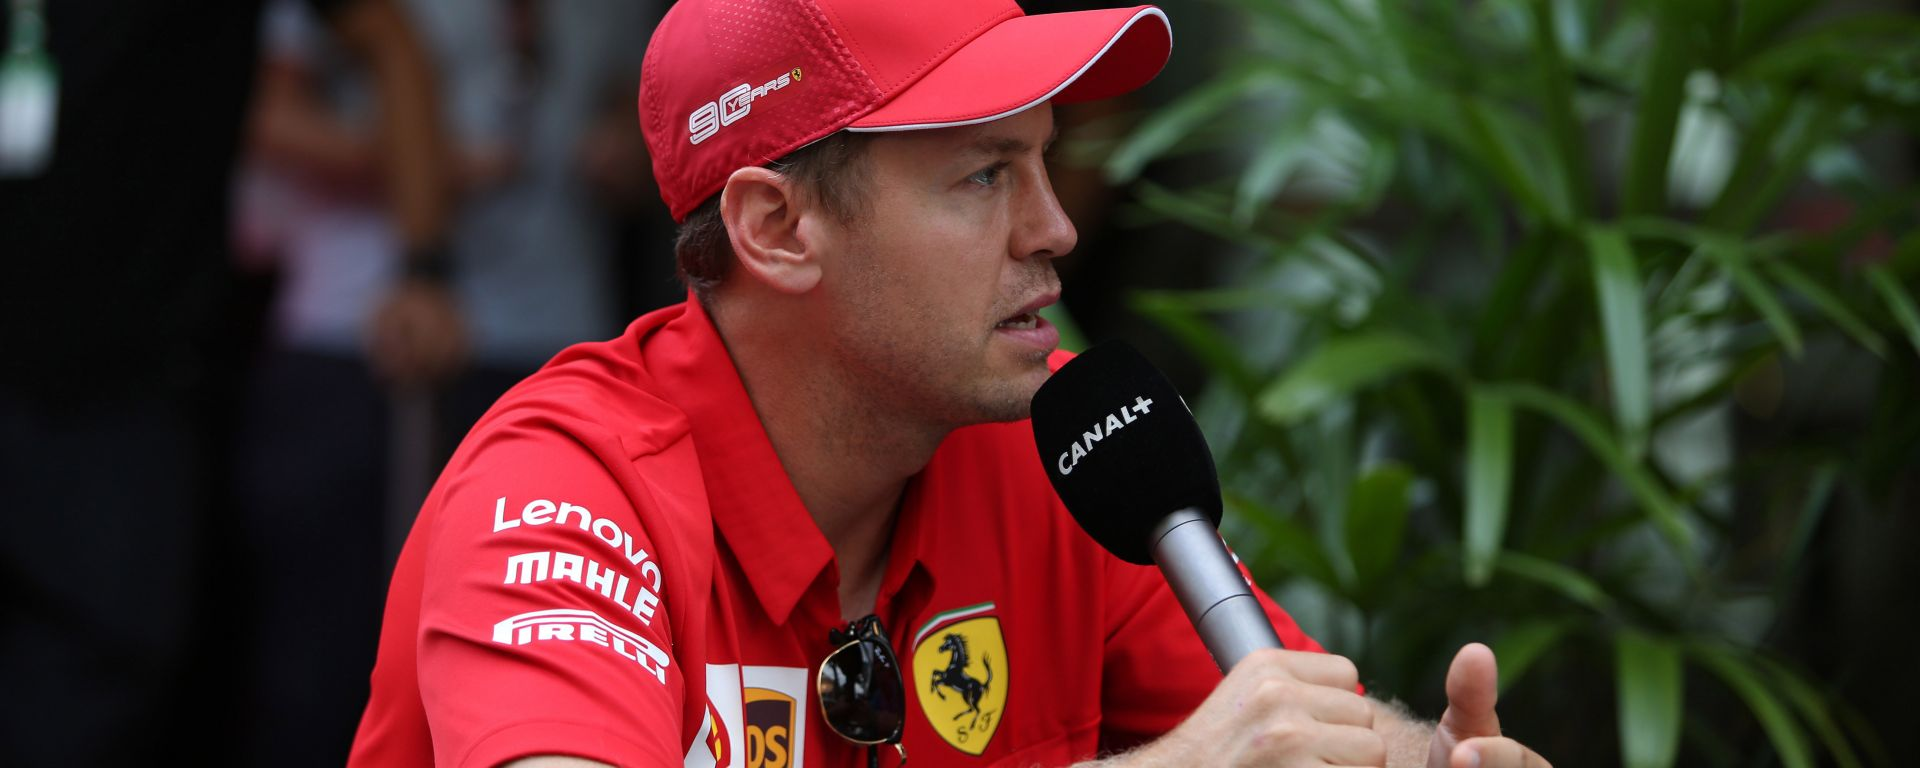 F1 GP Singapore 2019, Monza: Sebastian Vettel (Ferrari)